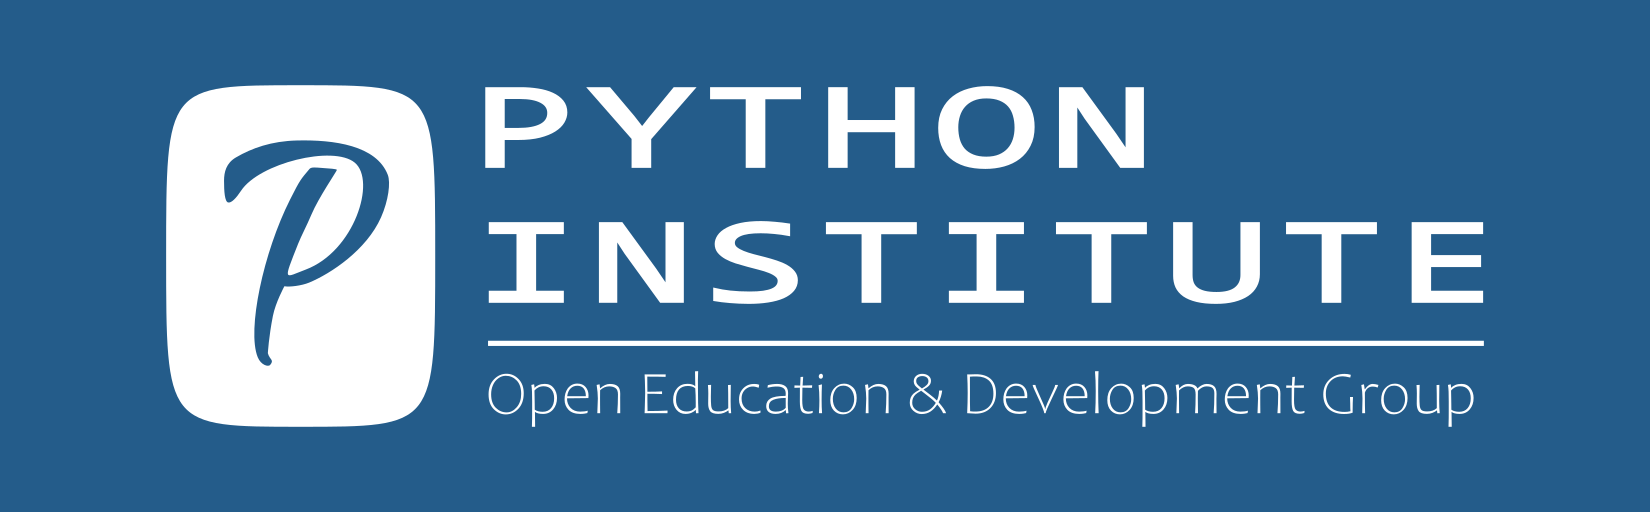 OpenEDG Python Institute logo